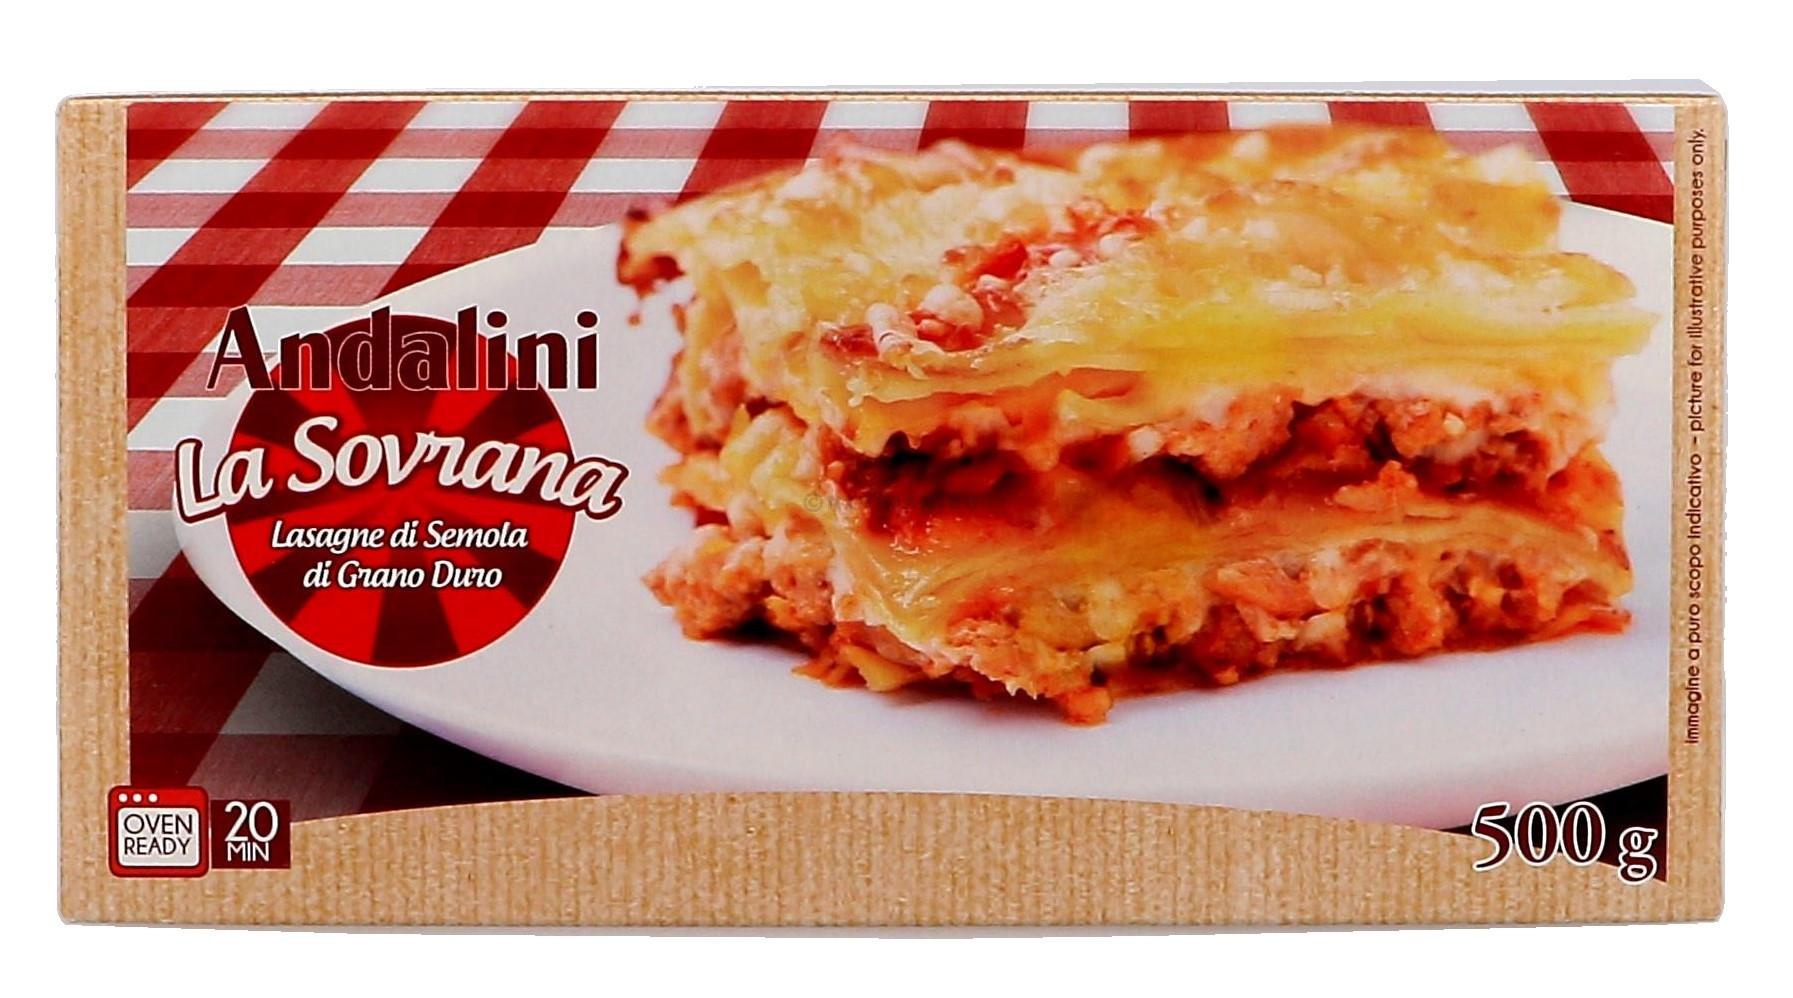 Andalini lasagnebladen naturel 500gr all'uovo (Lasagnebladen)